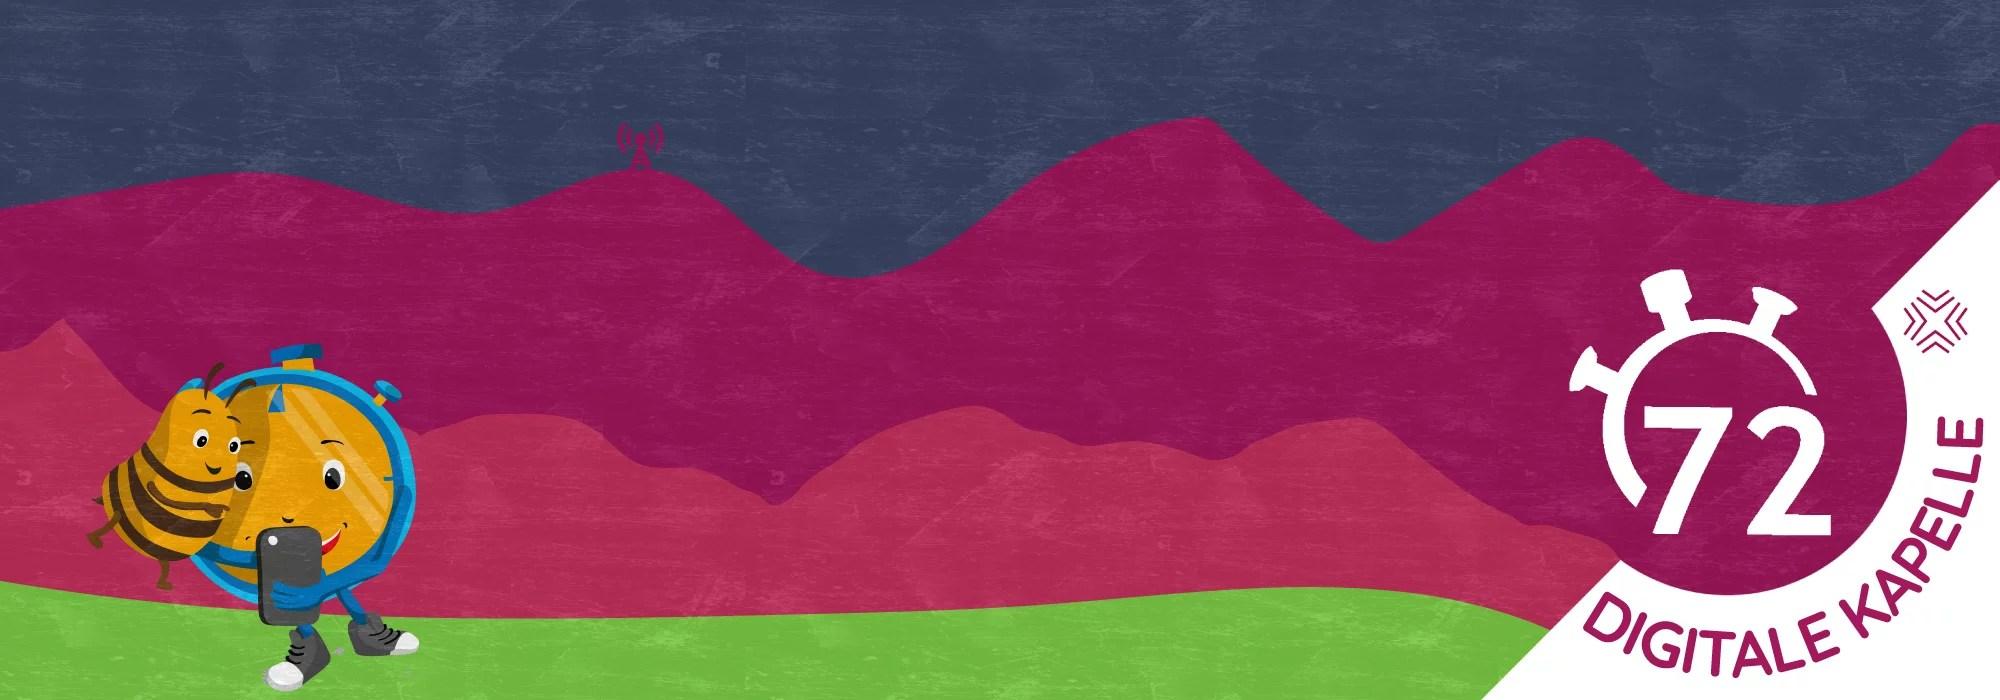 Berge versetzen! Digitale Kapelle #72h